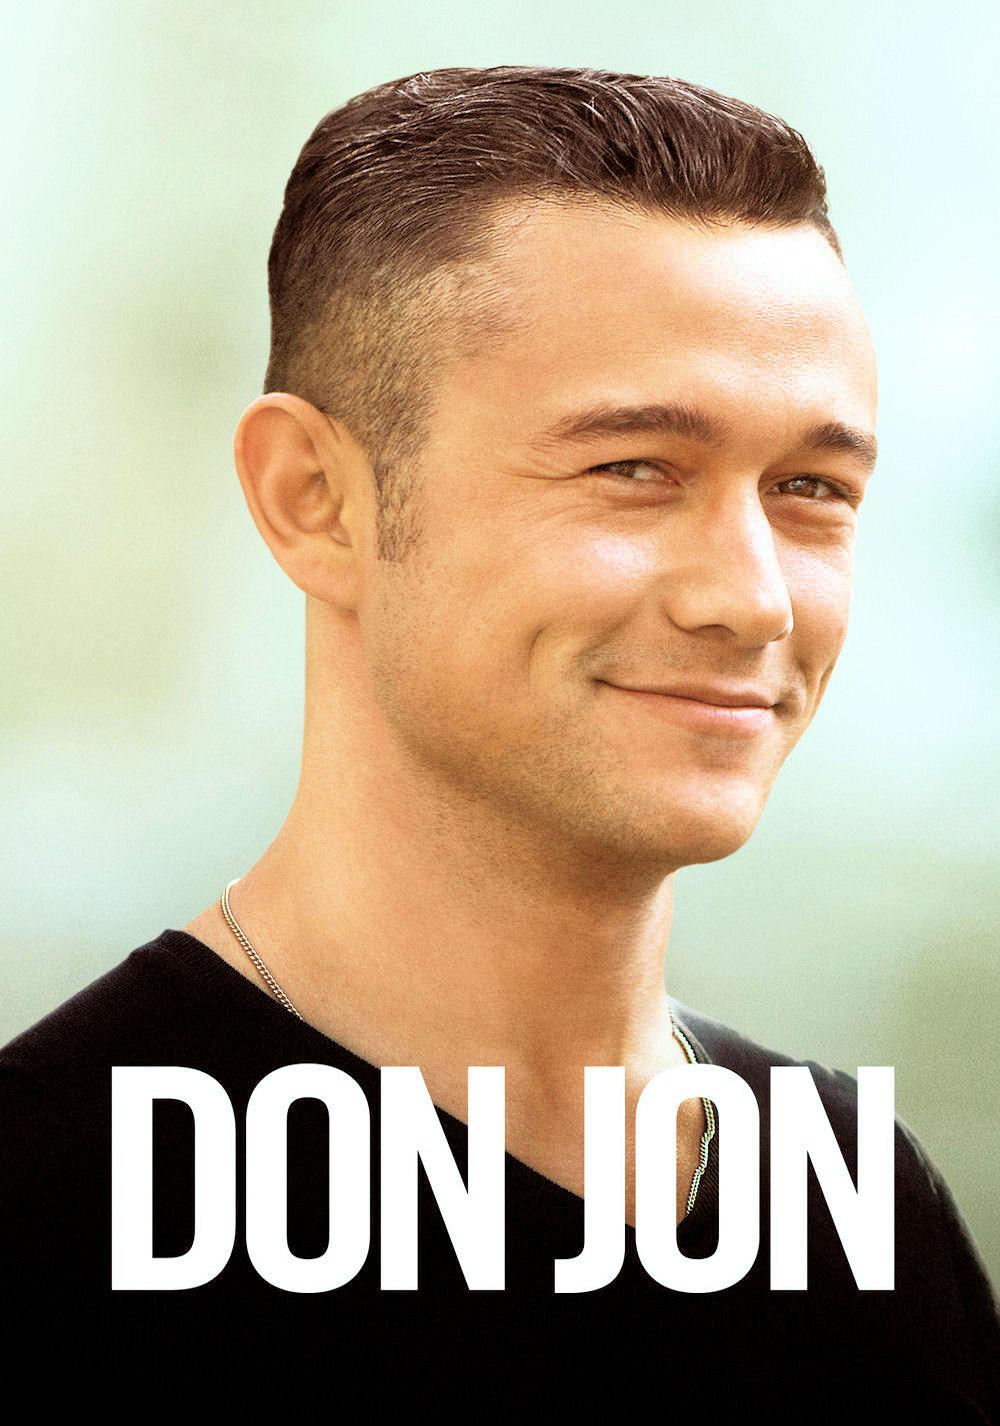 Don Jon Film